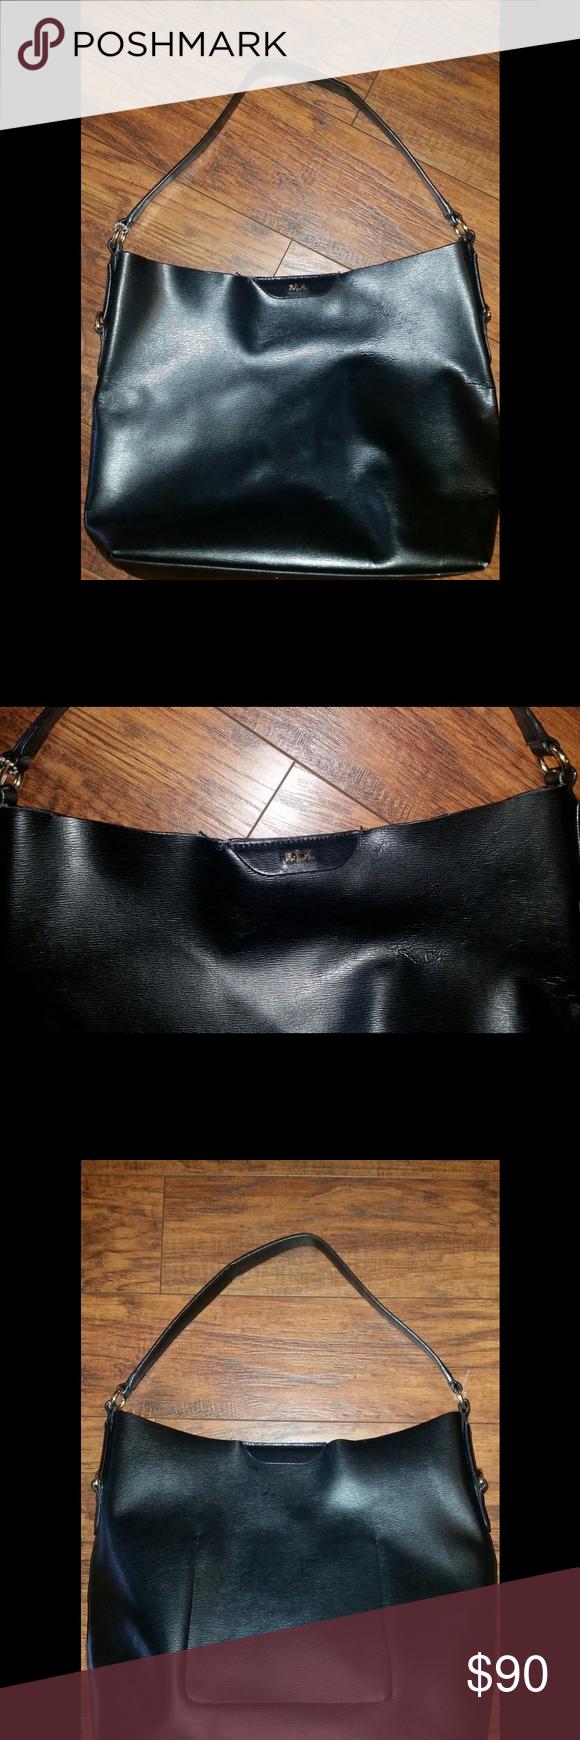 a6619c4e325 Ralph Lauren R.L.L. Leather Hobo Bag   My Posh Closet   Pinterest   Ralph  lauren bags, Hobo bags and Closure